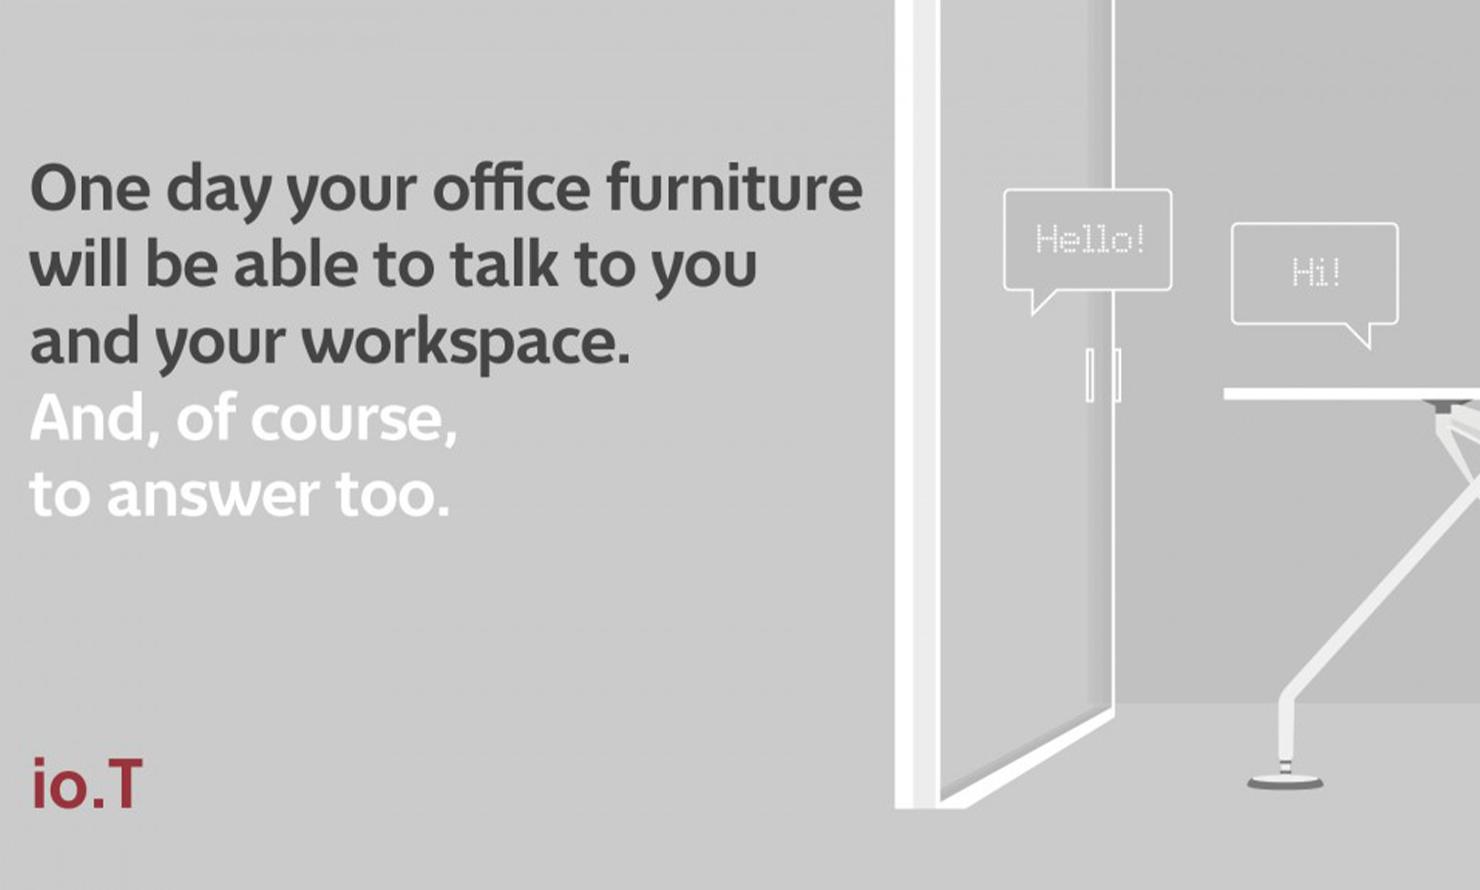 https://www.kubelibre.com/uploads/Slider-work-tutti-clienti/tecno-redesigning-the-future-of-the-future-of-work-13.jpg